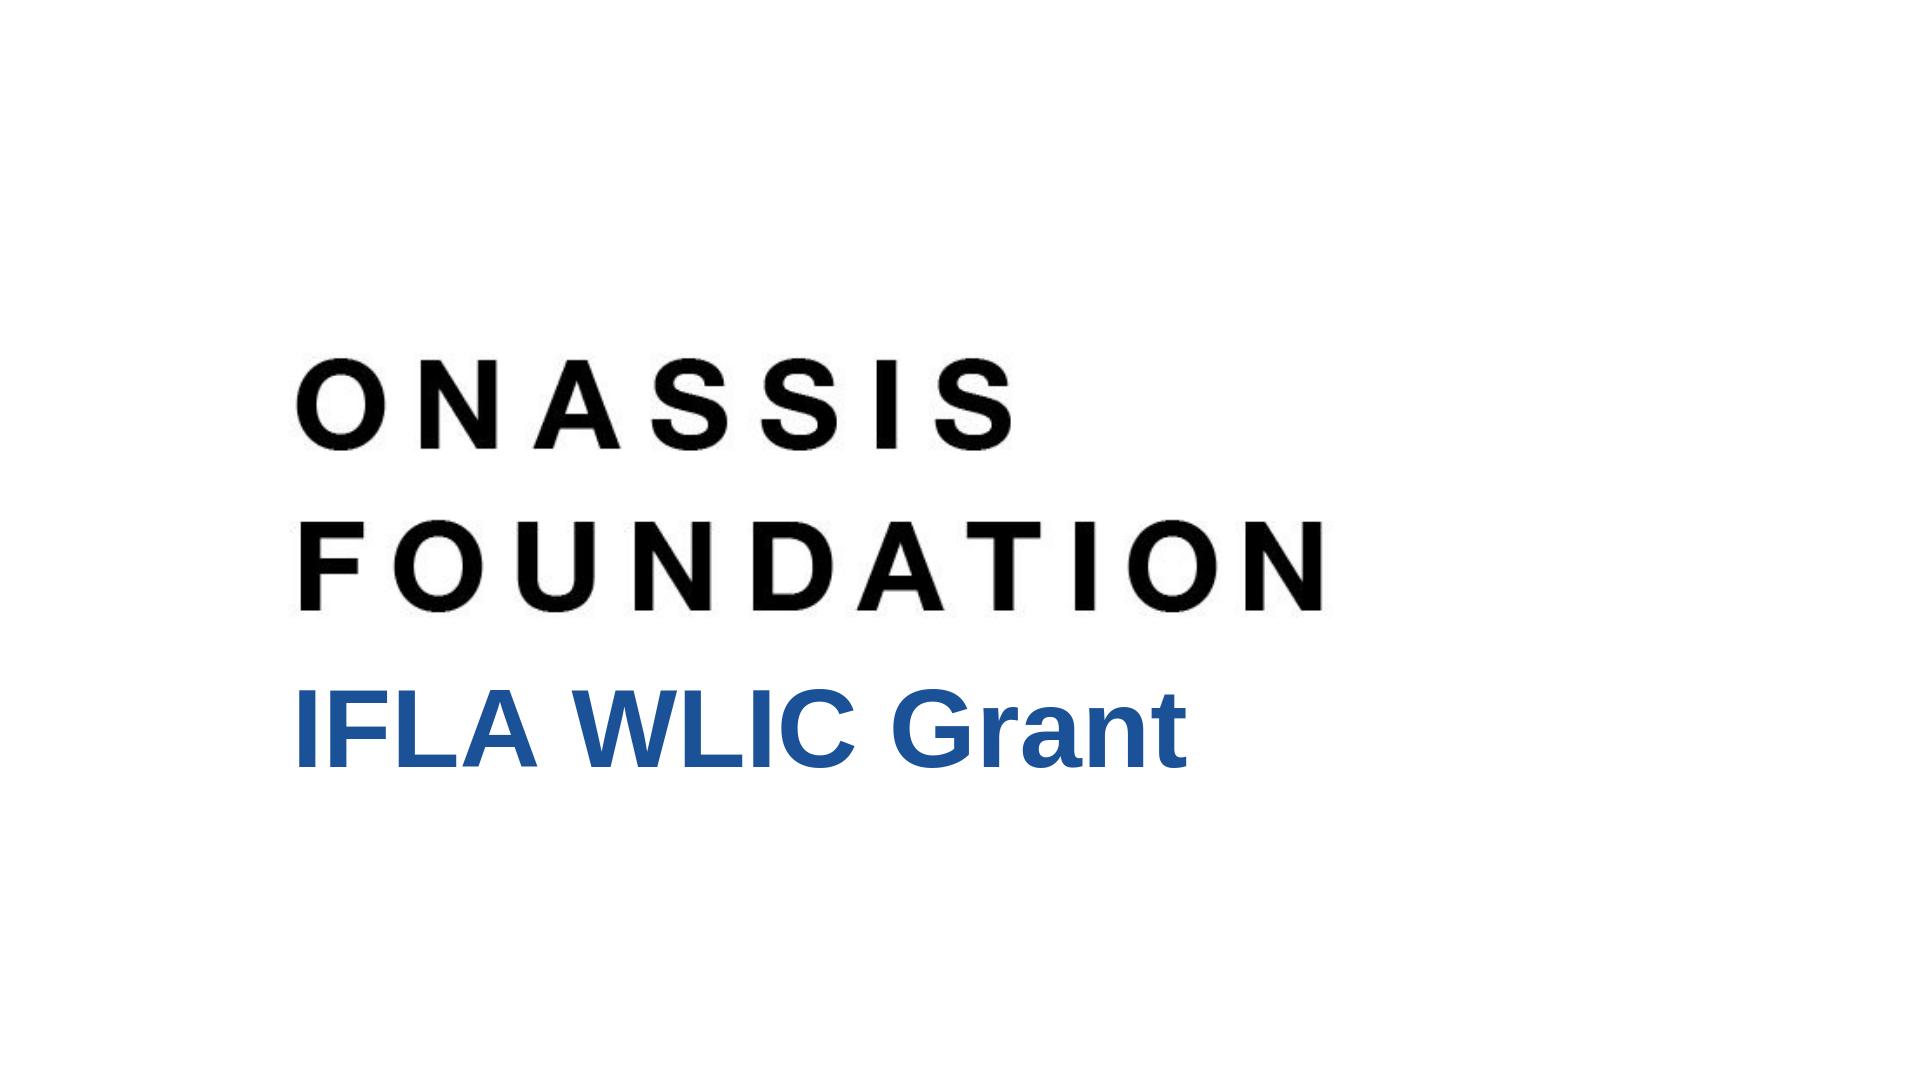 Onassis foundation grant